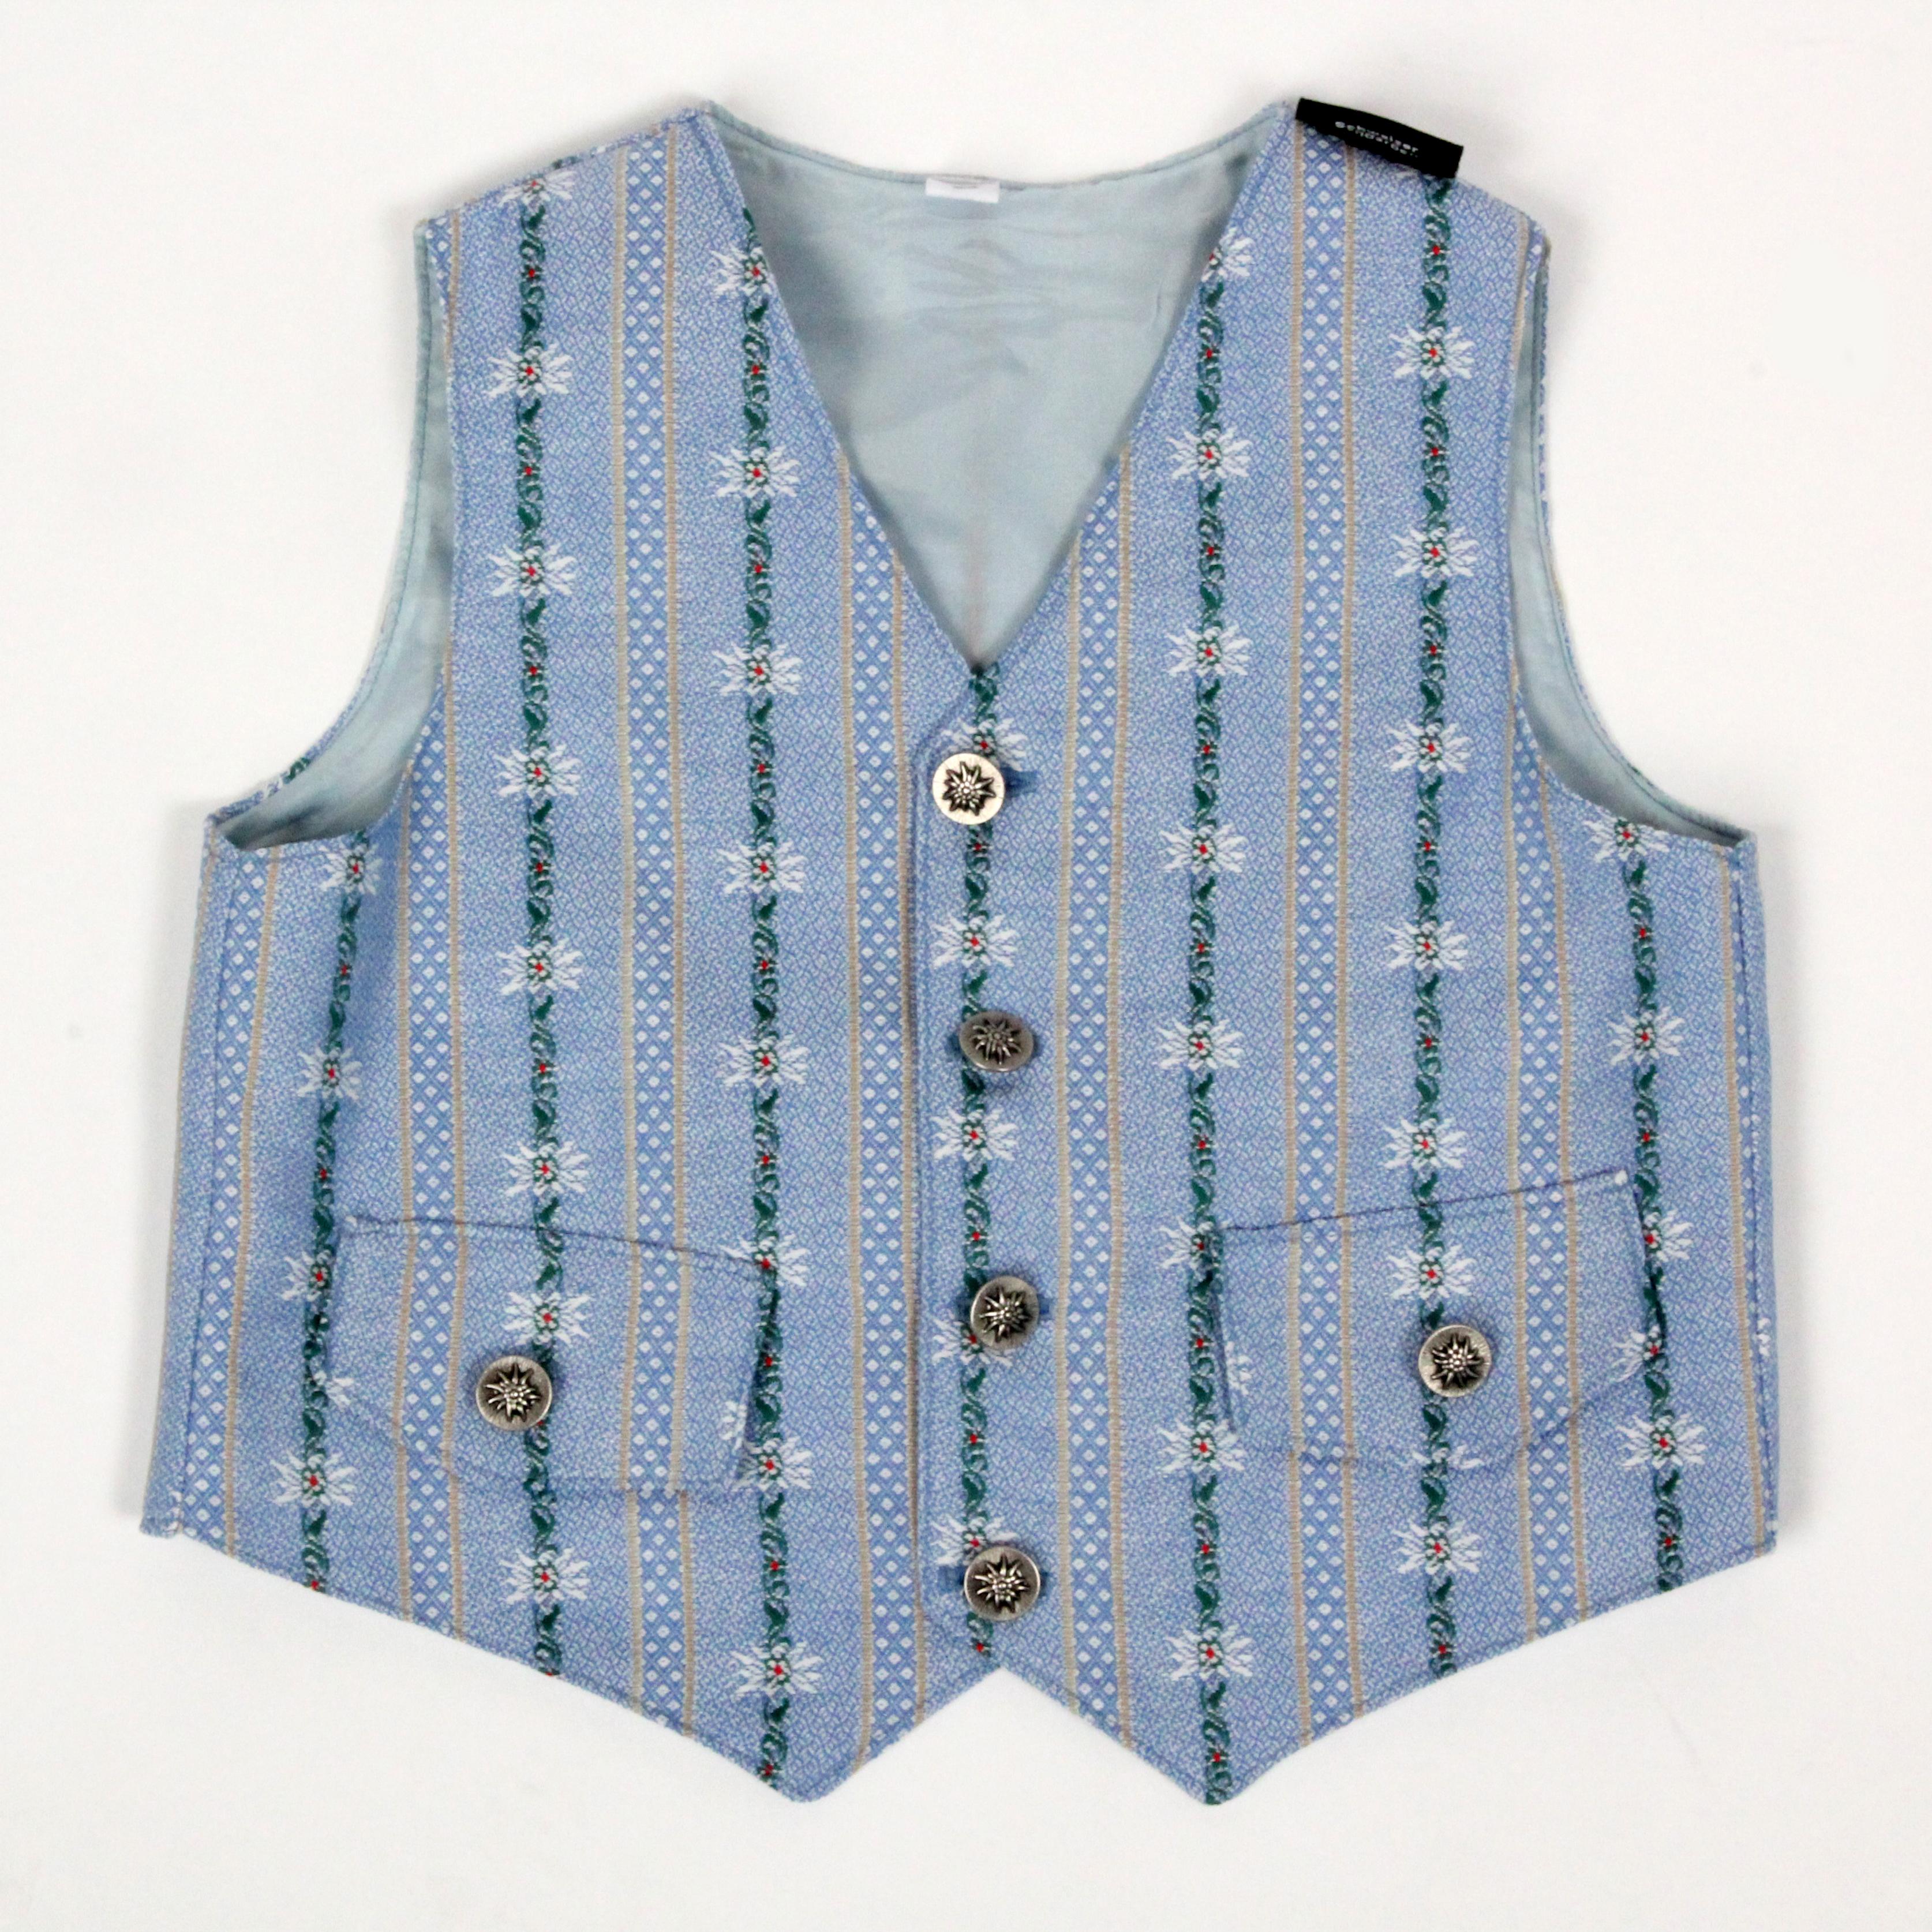 Edelweiss Gilet hellblau, Kind